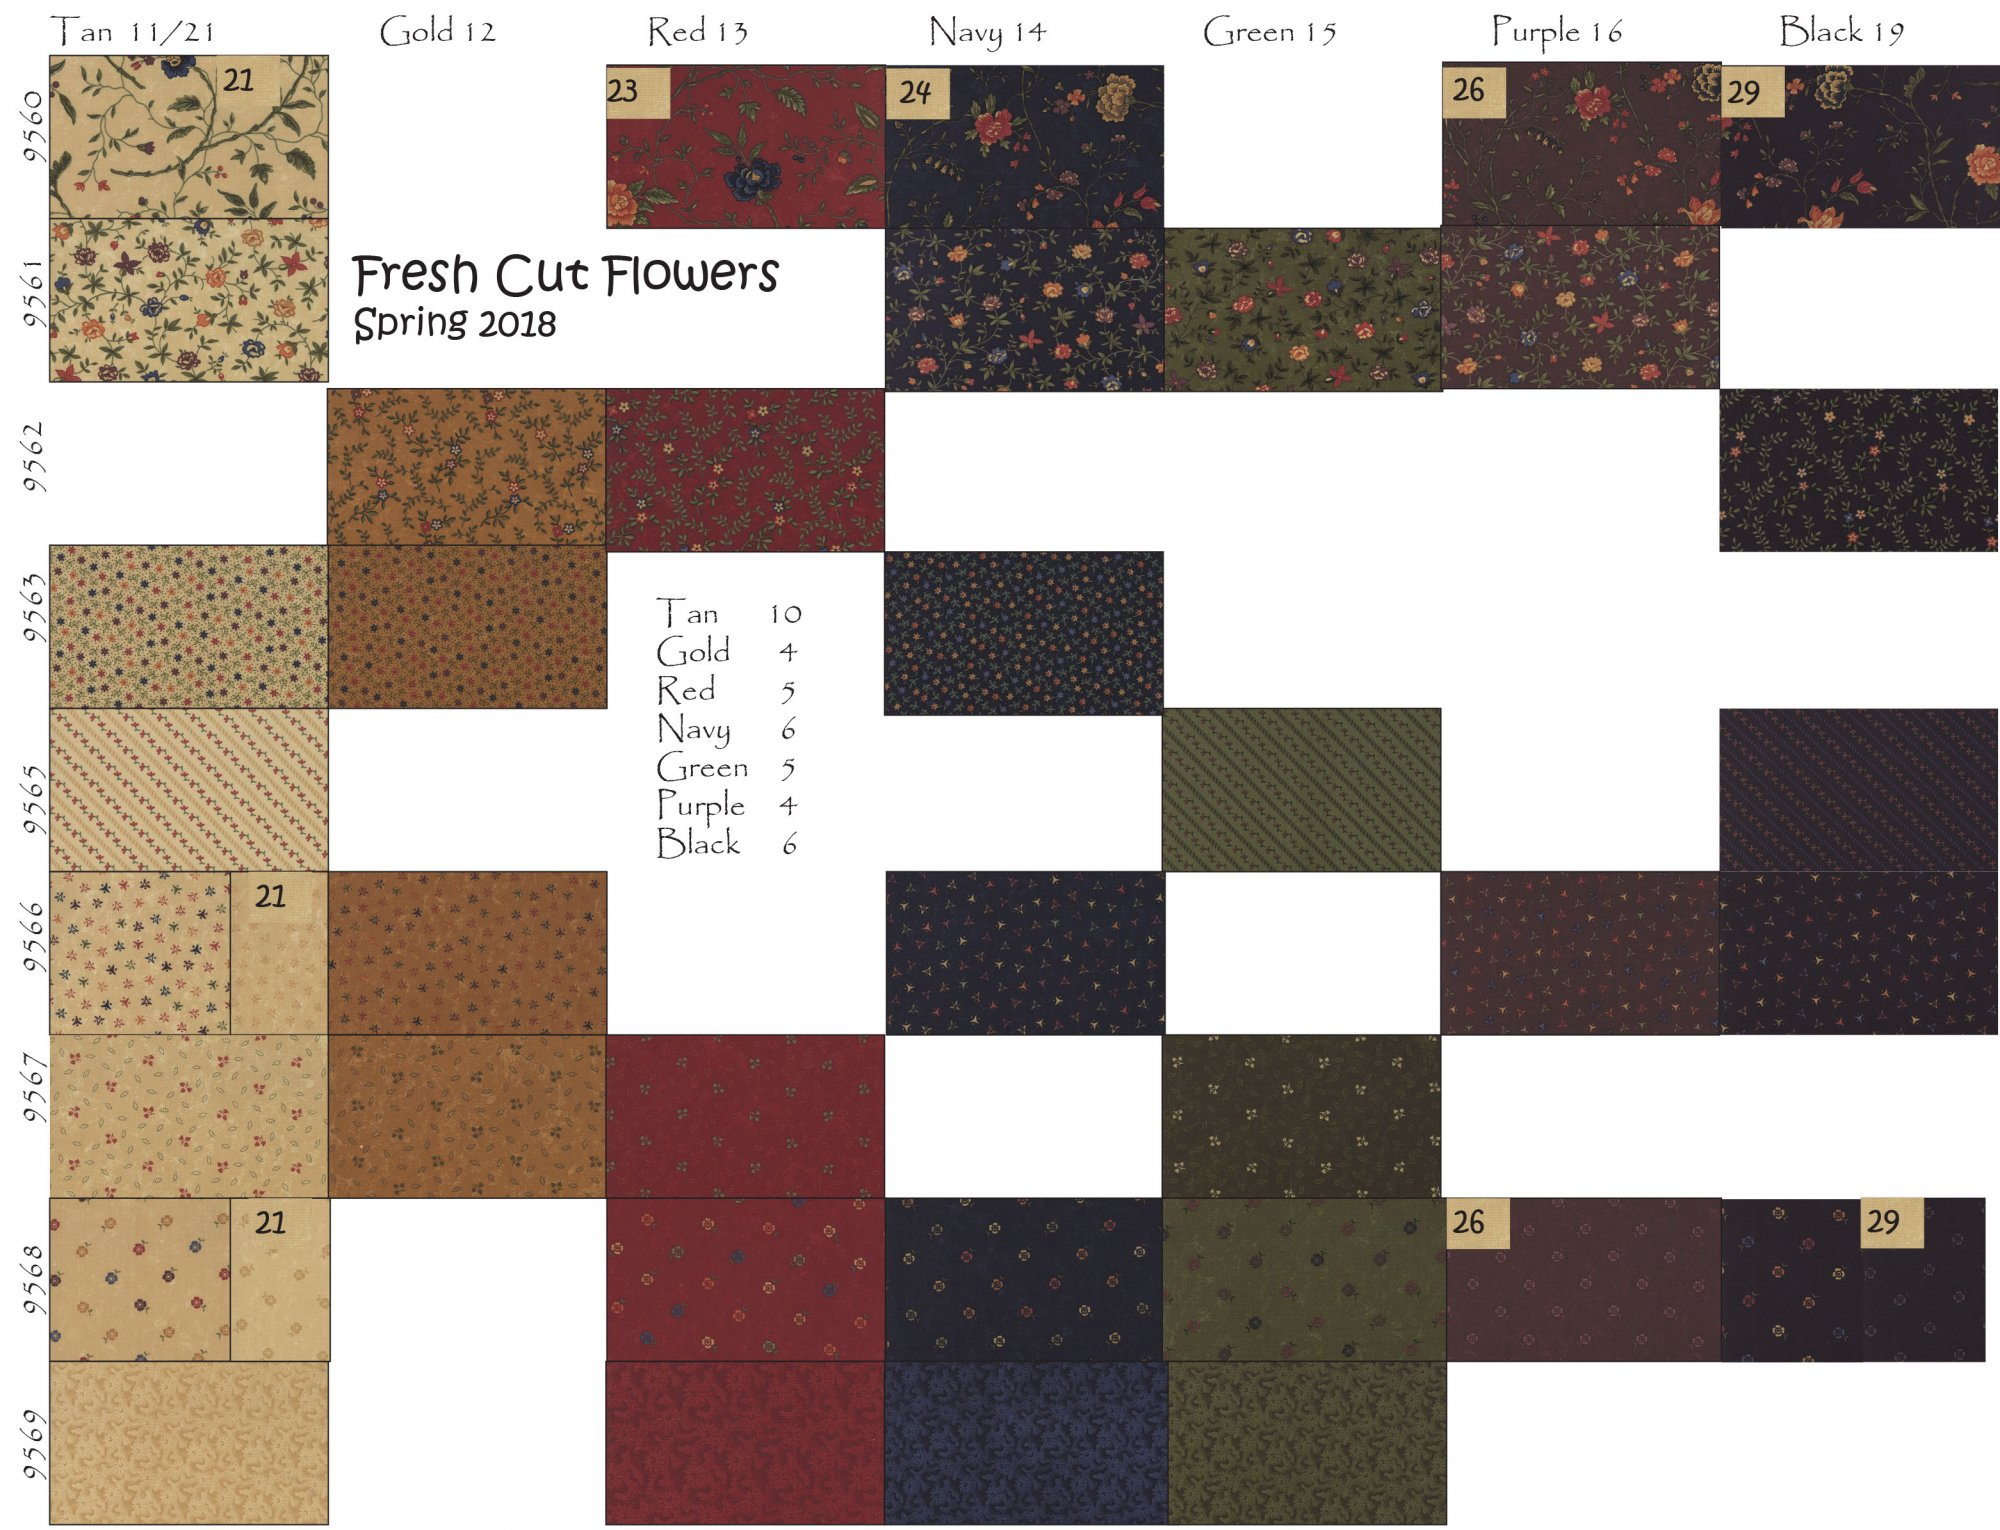 Fresh Cut Flowers Swatch Chart